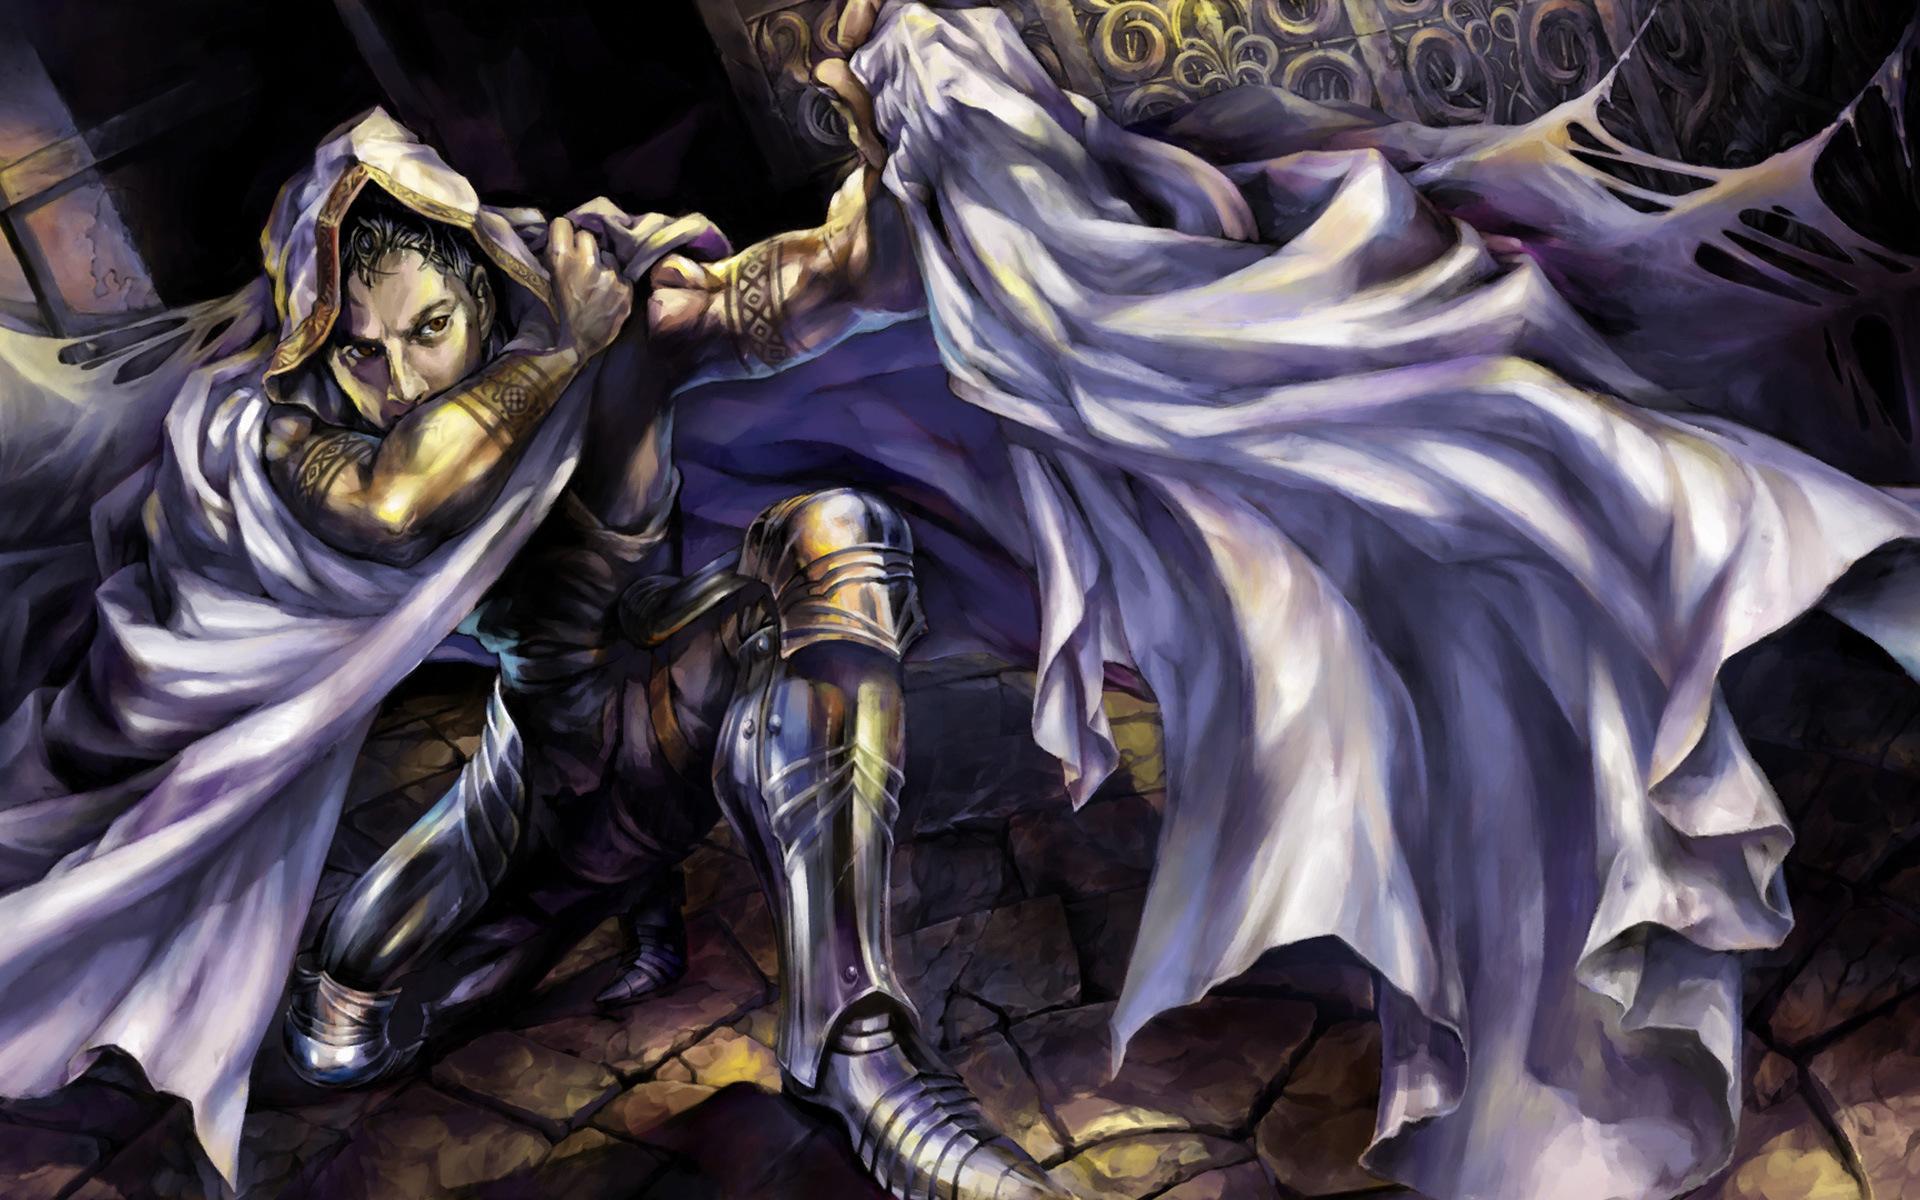 dragons-crown-art-04-1920x1200.jpg